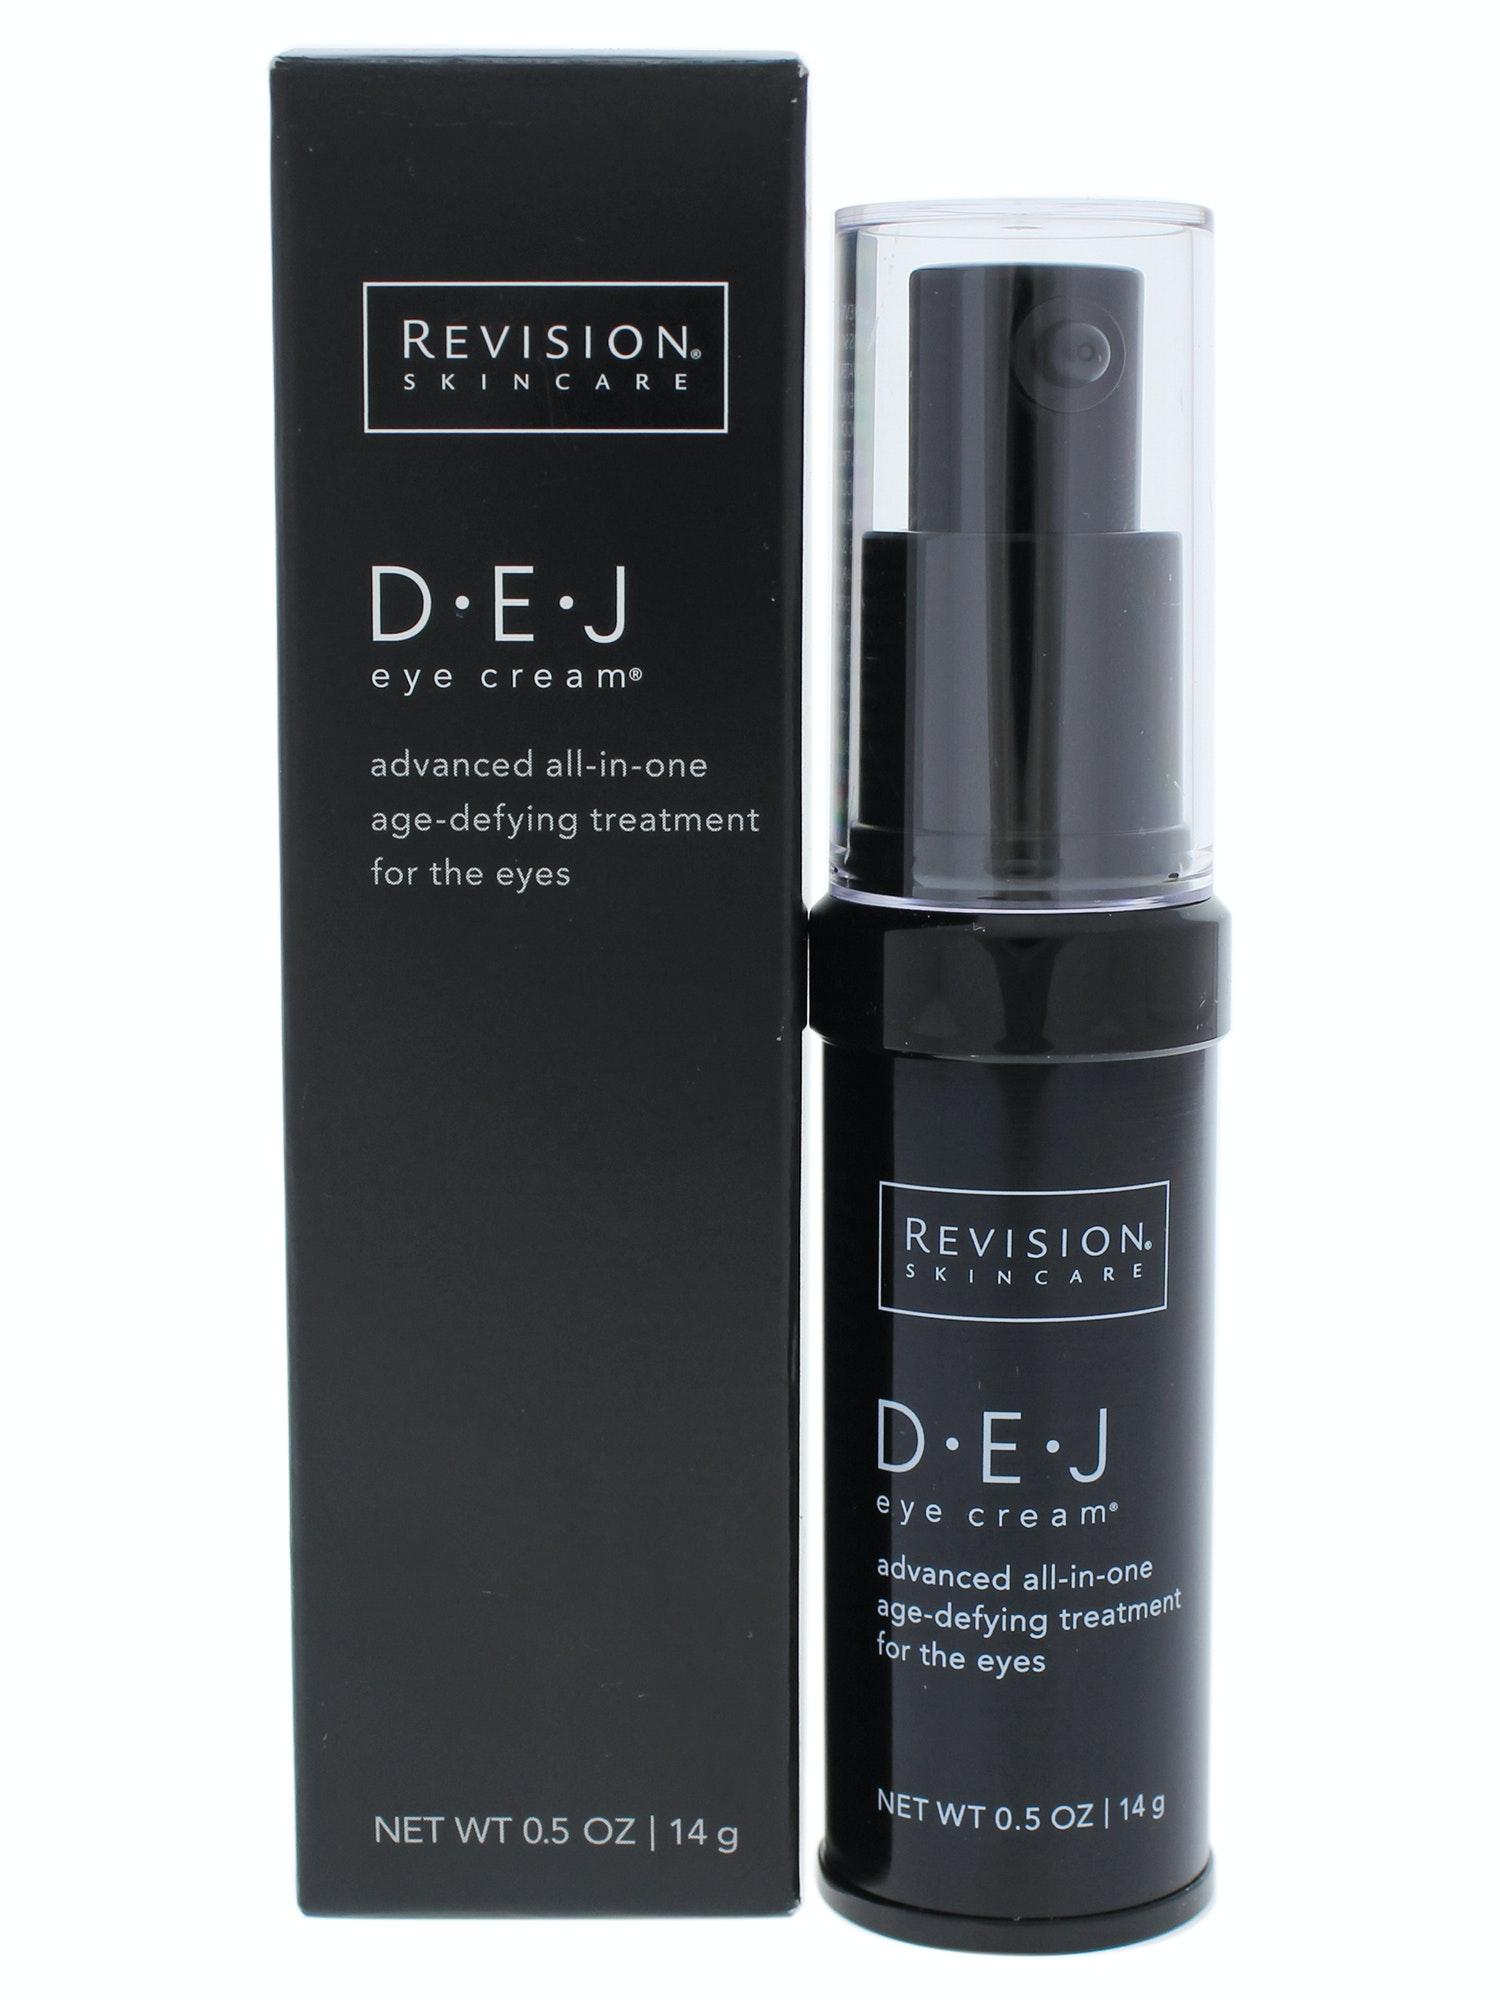 Revision Skincare D-E-J Eye Cream